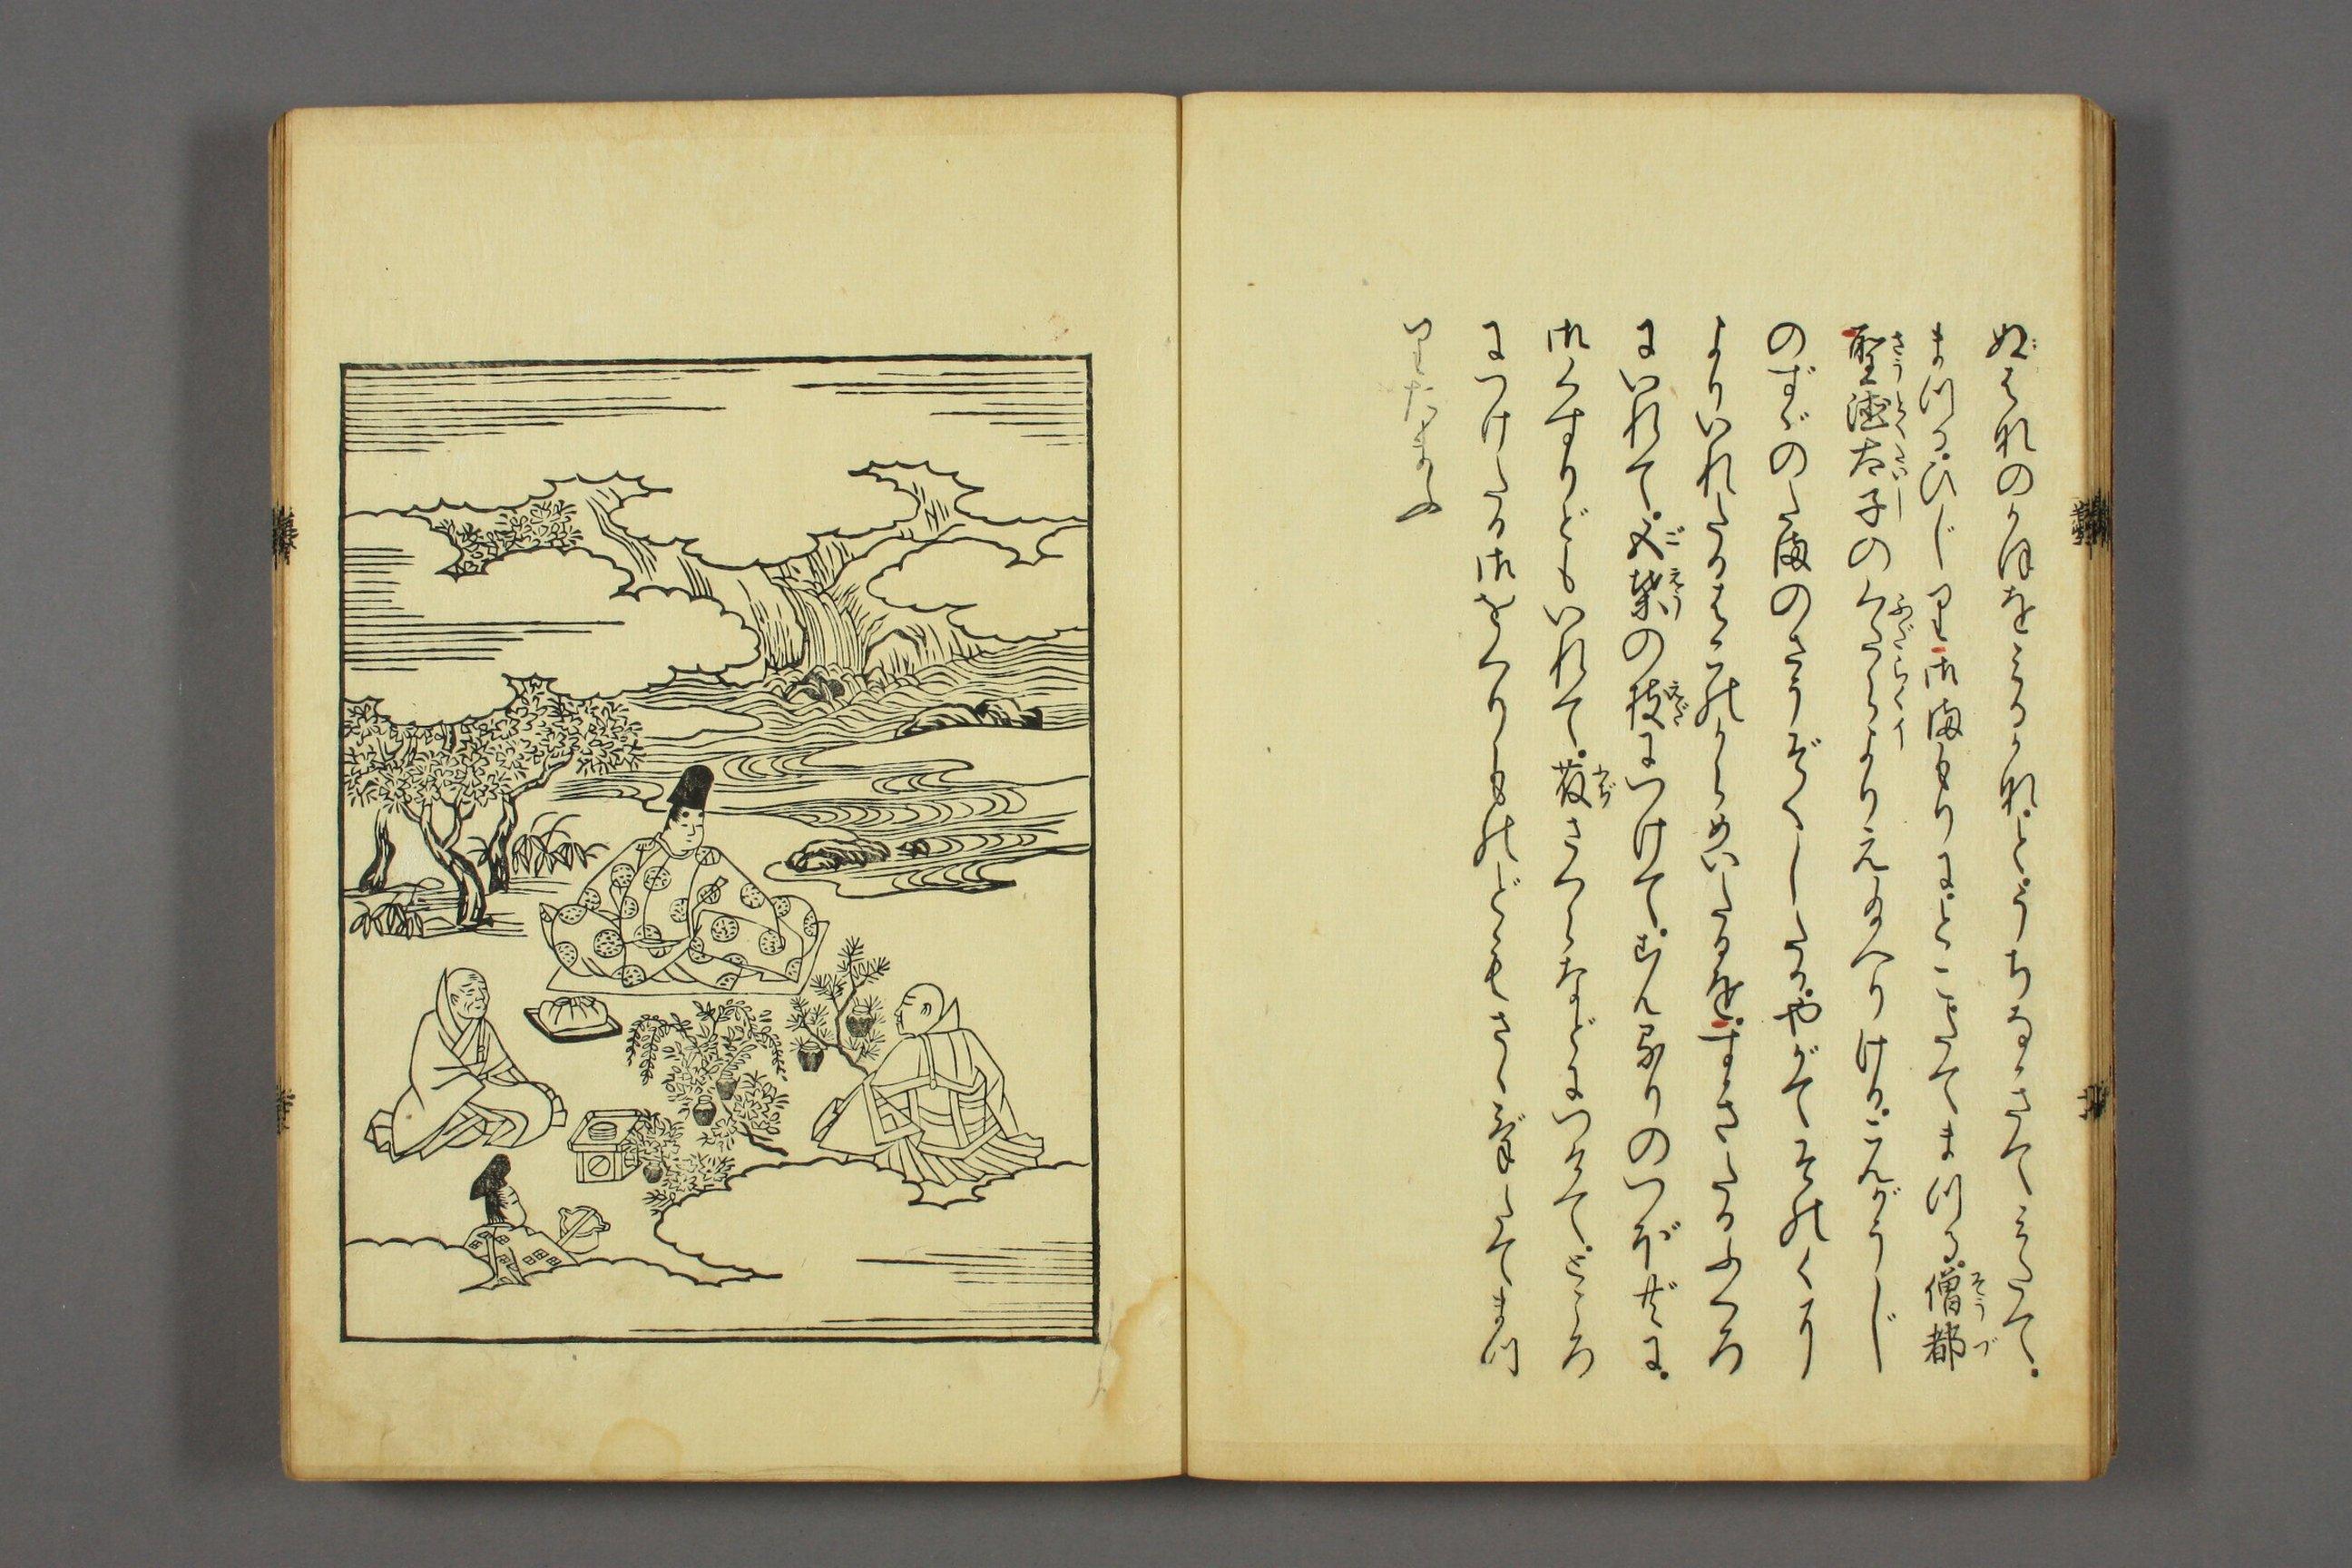 http://archive.wul.waseda.ac.jp/kosho/bunko30/bunko30_a0007/bunko30_a0007_0005/bunko30_a0007_0005_p0021.jpg